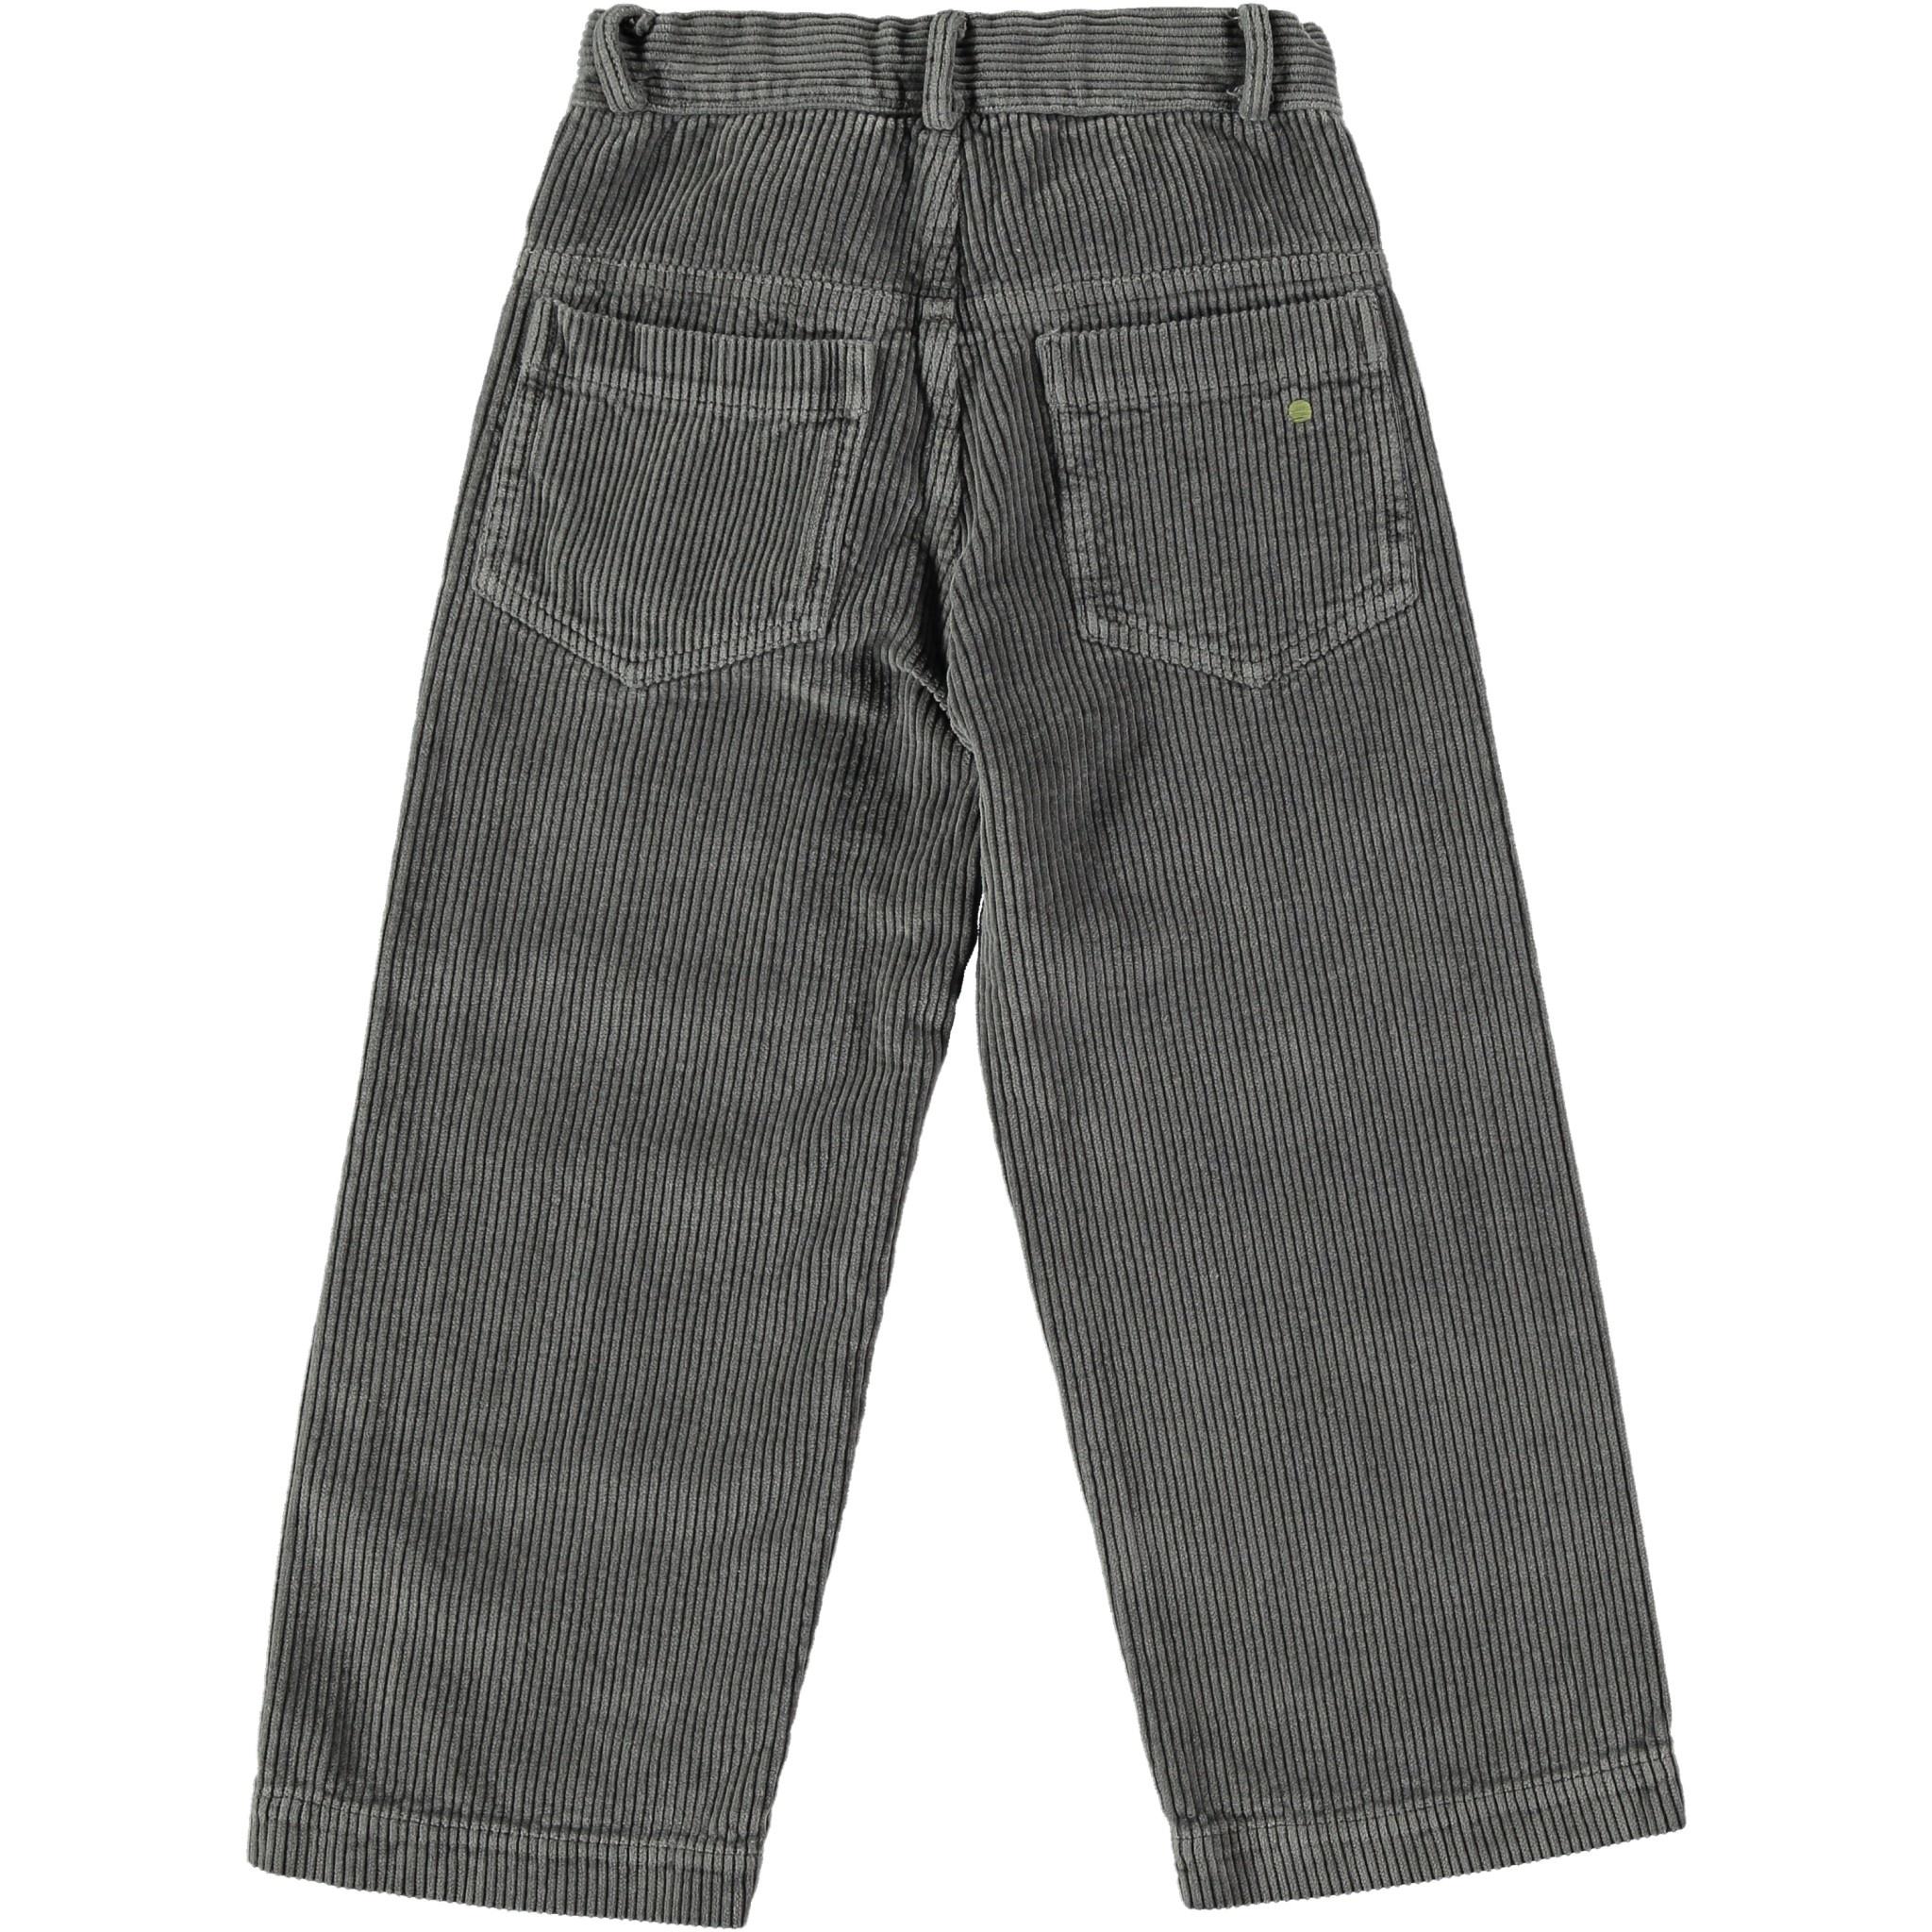 Corduroy trouser everyday good night-2